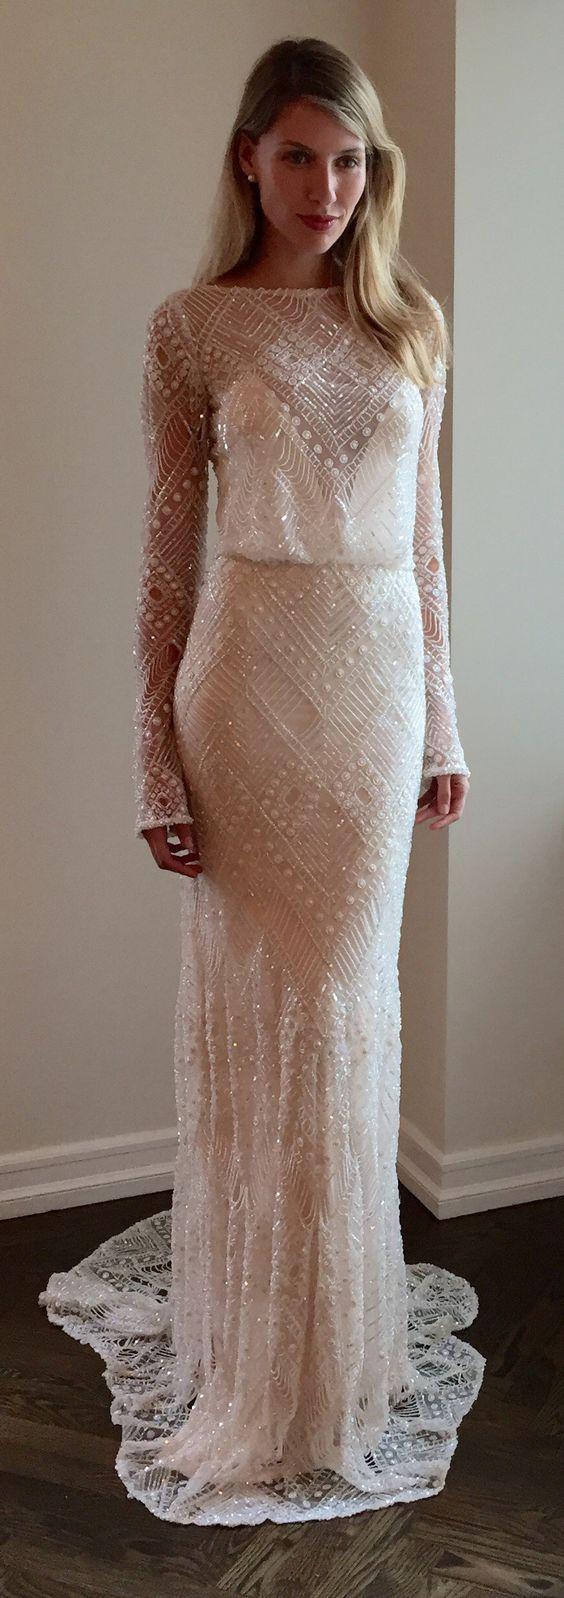 @roressclothes closet ideas #women fashion outfit #clothing style apparel white maxi dress